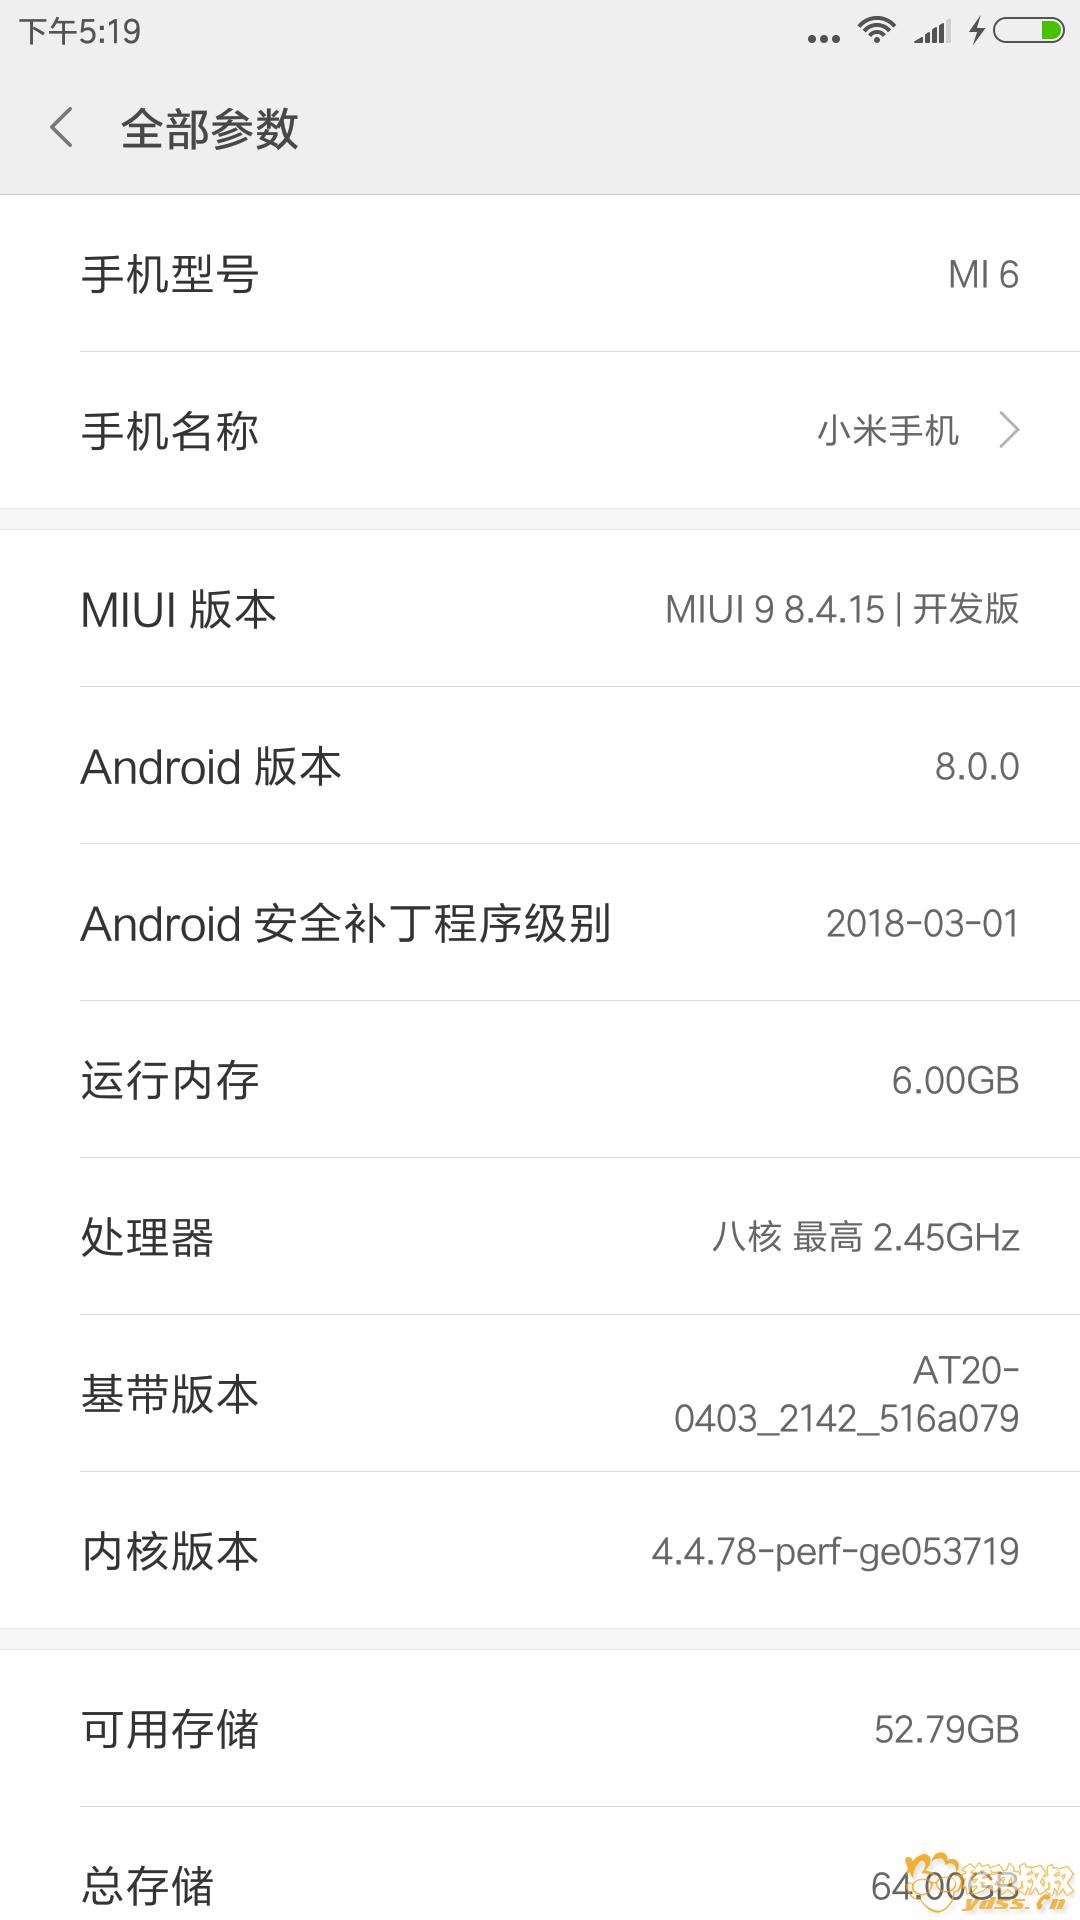 Screenshot_2018-04-15-17-19-19-030_com.android.settings.png